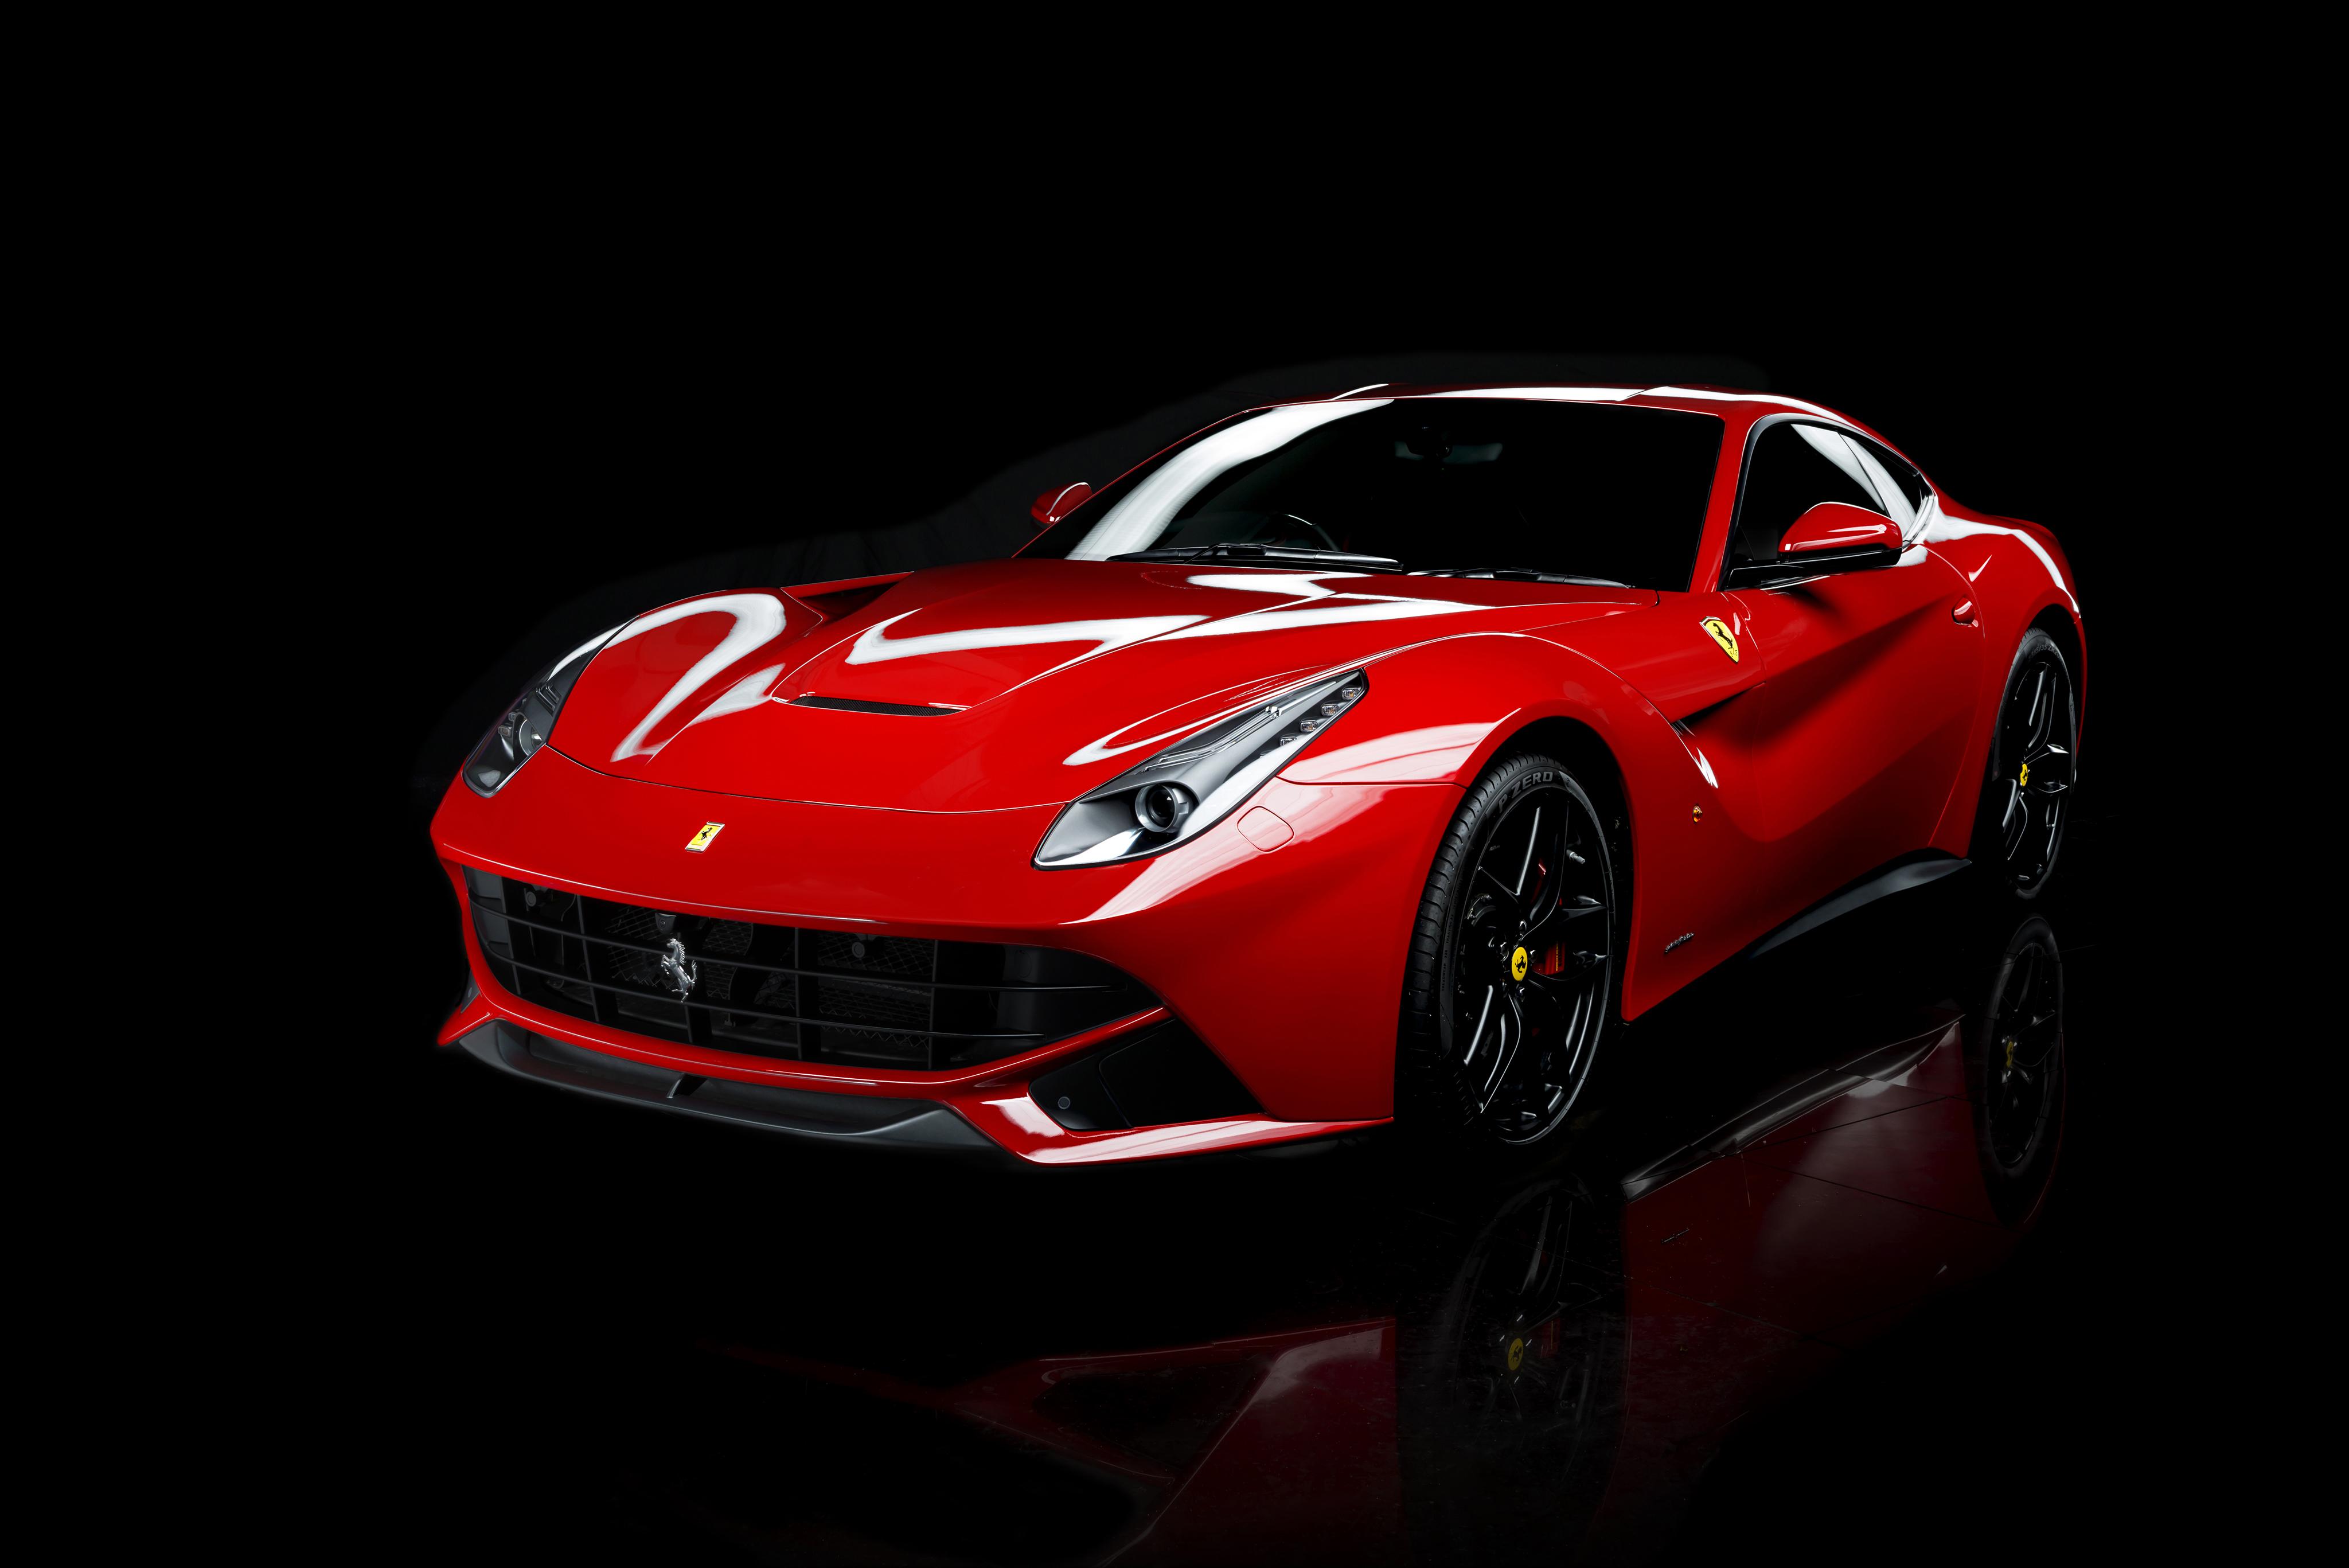 Ferrari F12 дорога забор  № 2438037 без смс